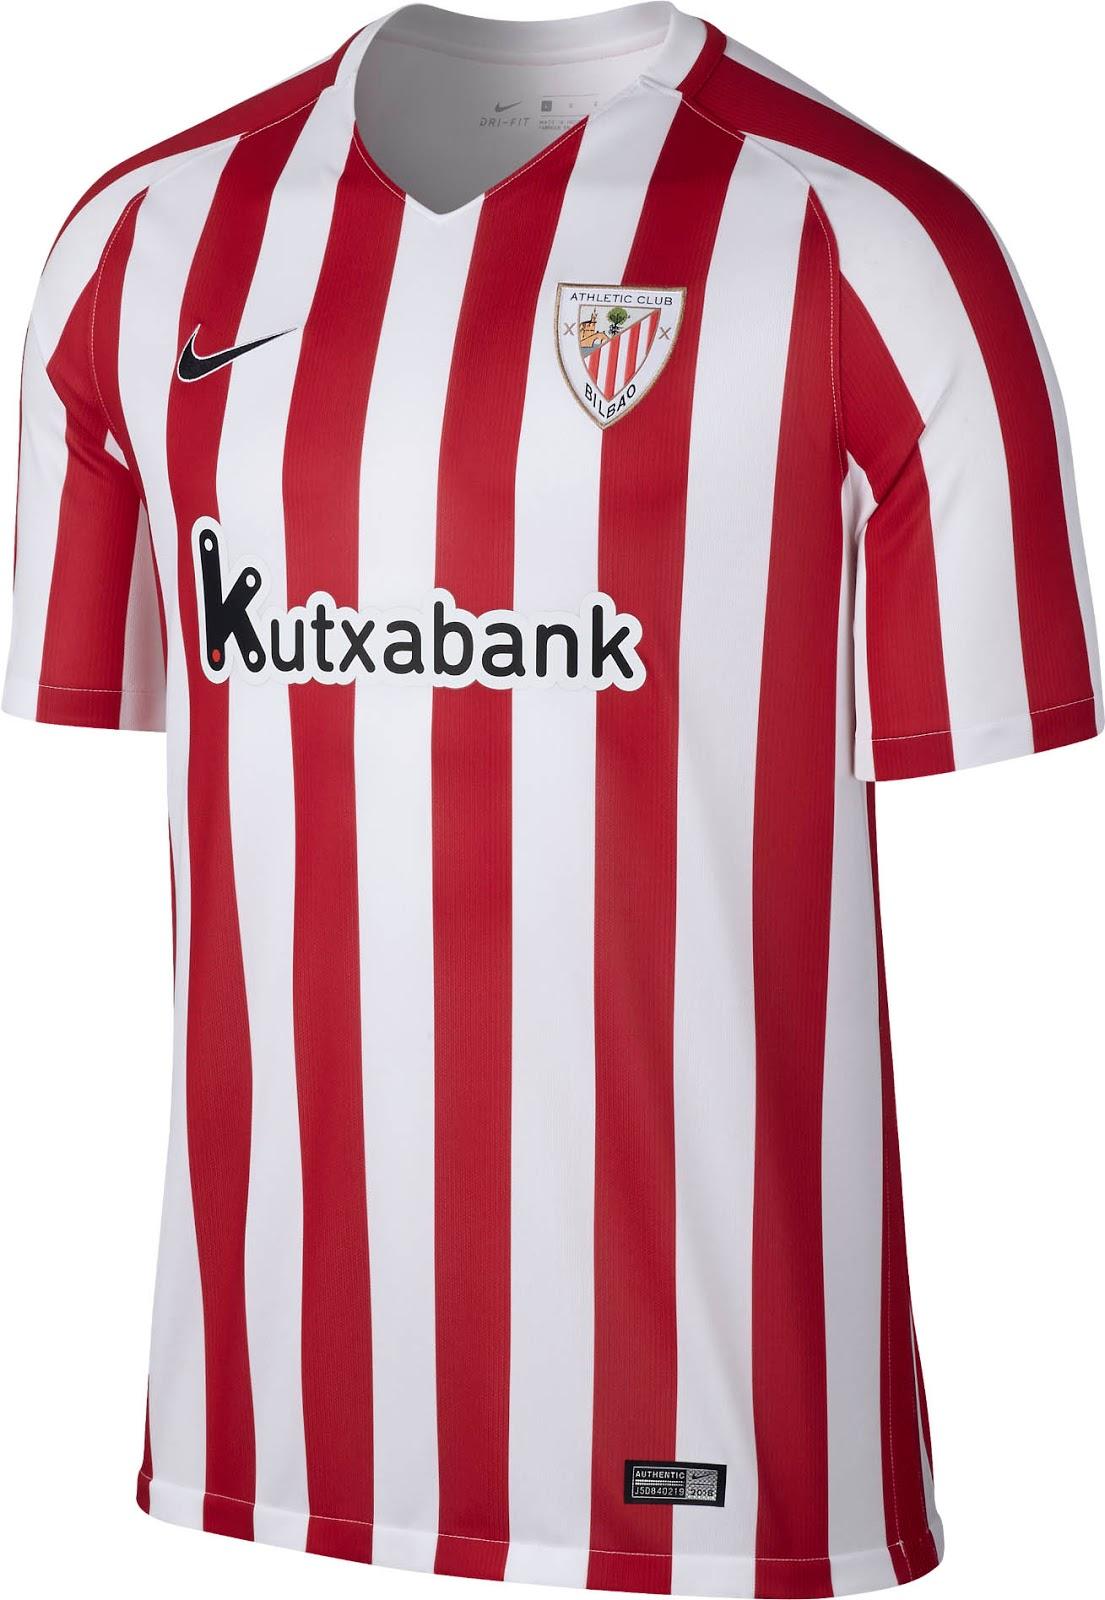 Athletic Bilbao 16-17 Home Kit Released - Footy Headlines